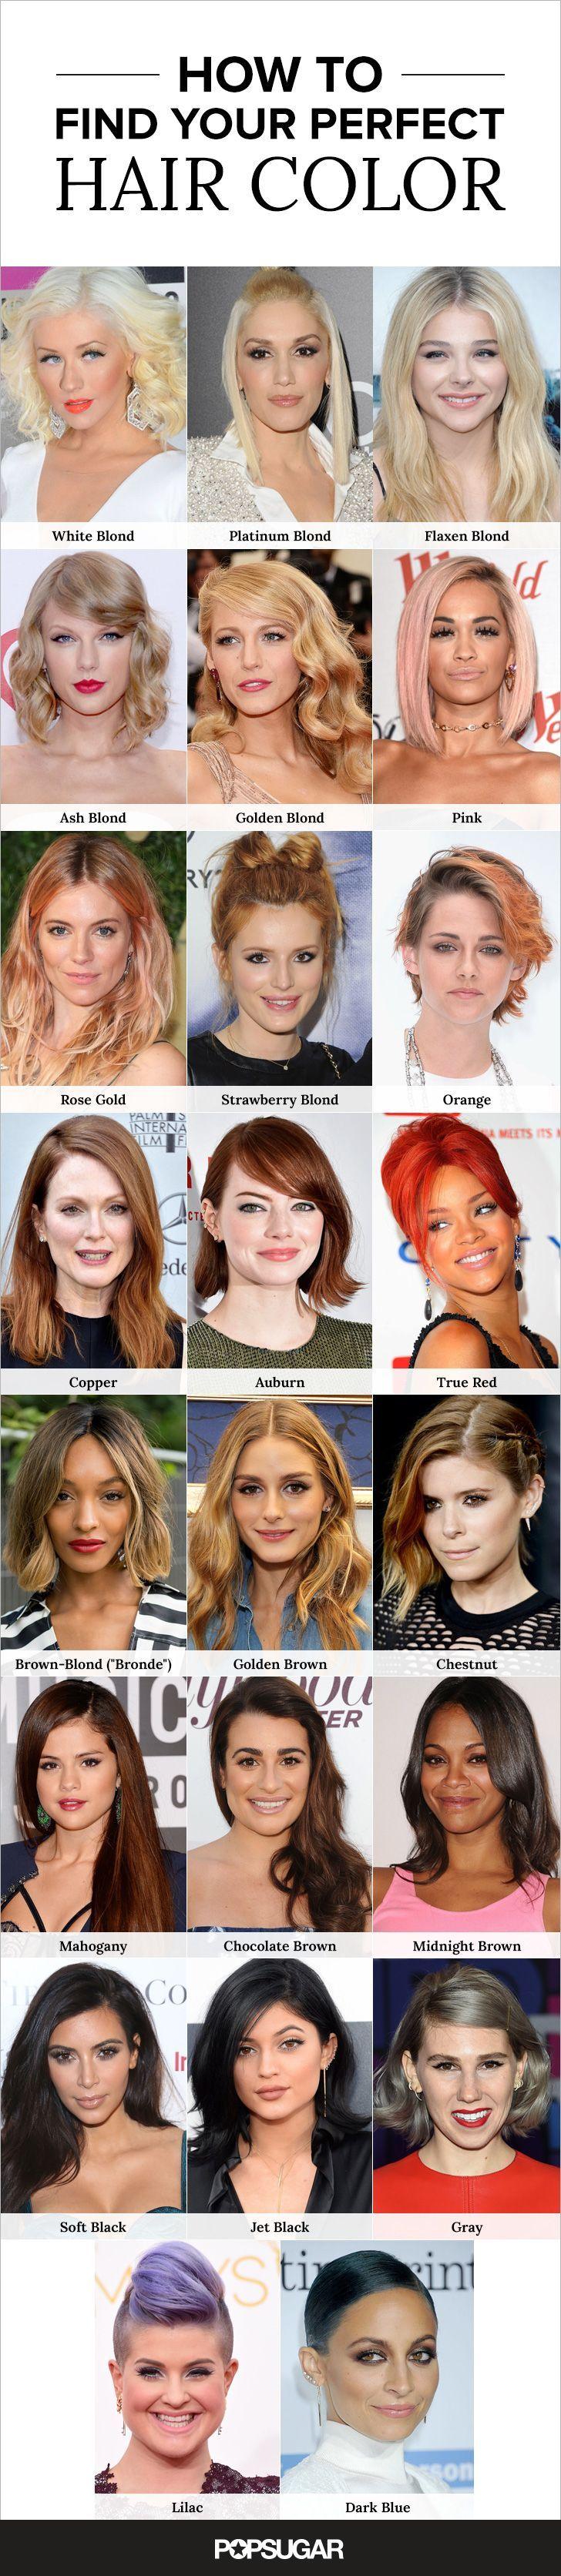 Style Na Hair Korean Salon by Joel Park - Home | Facebook